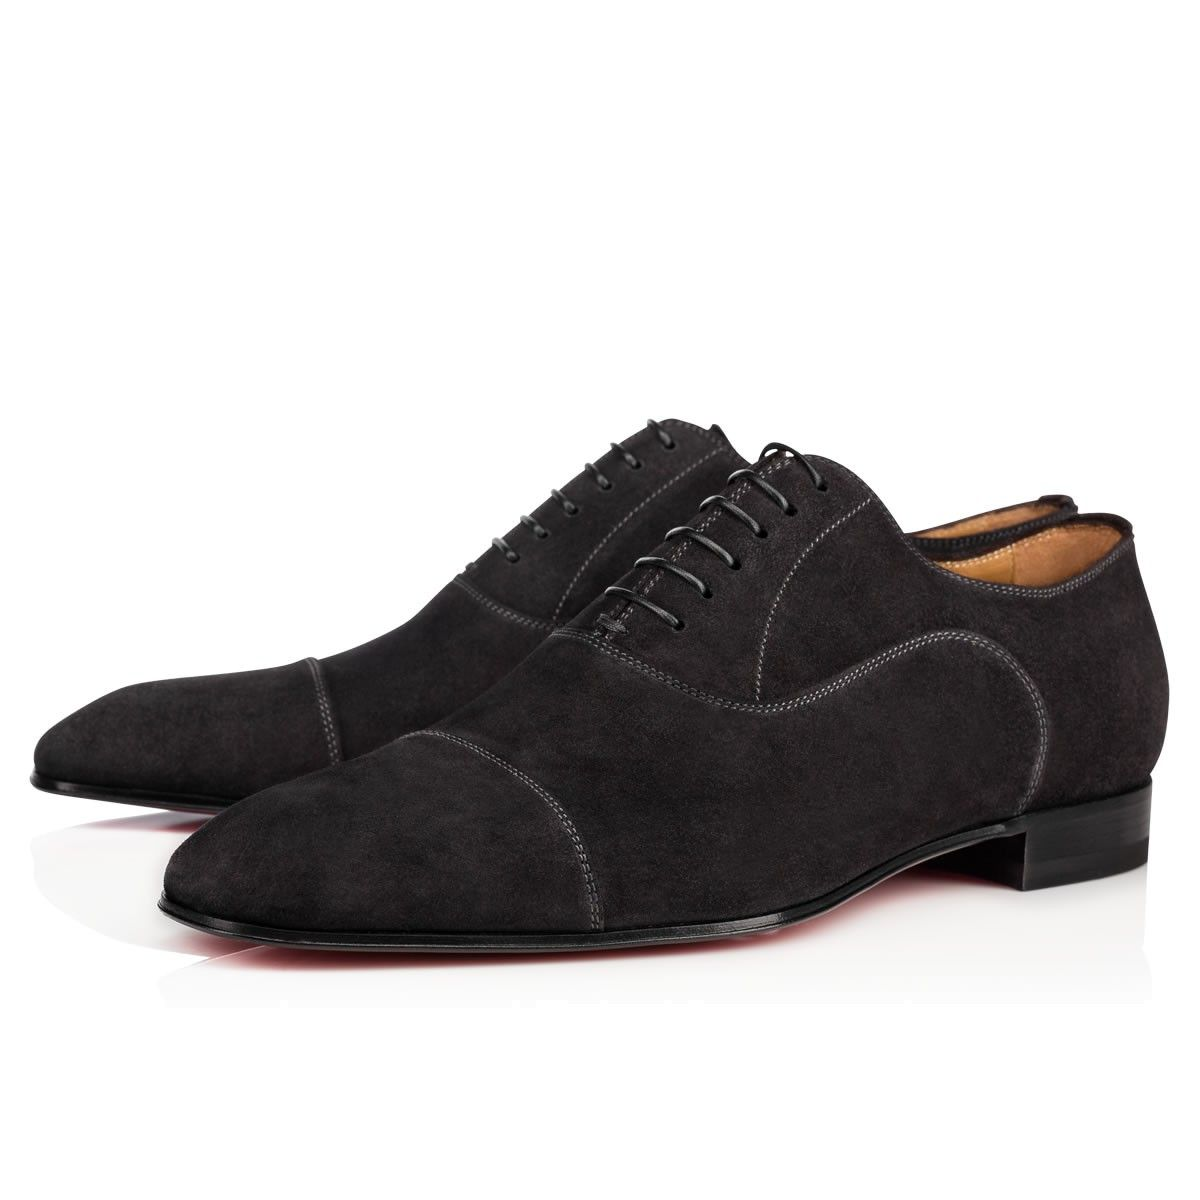 CHRISTIAN LOUBOUTIN Greggo Veau Velours Fusain Veau Velours - Men Shoes - Christian  Louboutin. #